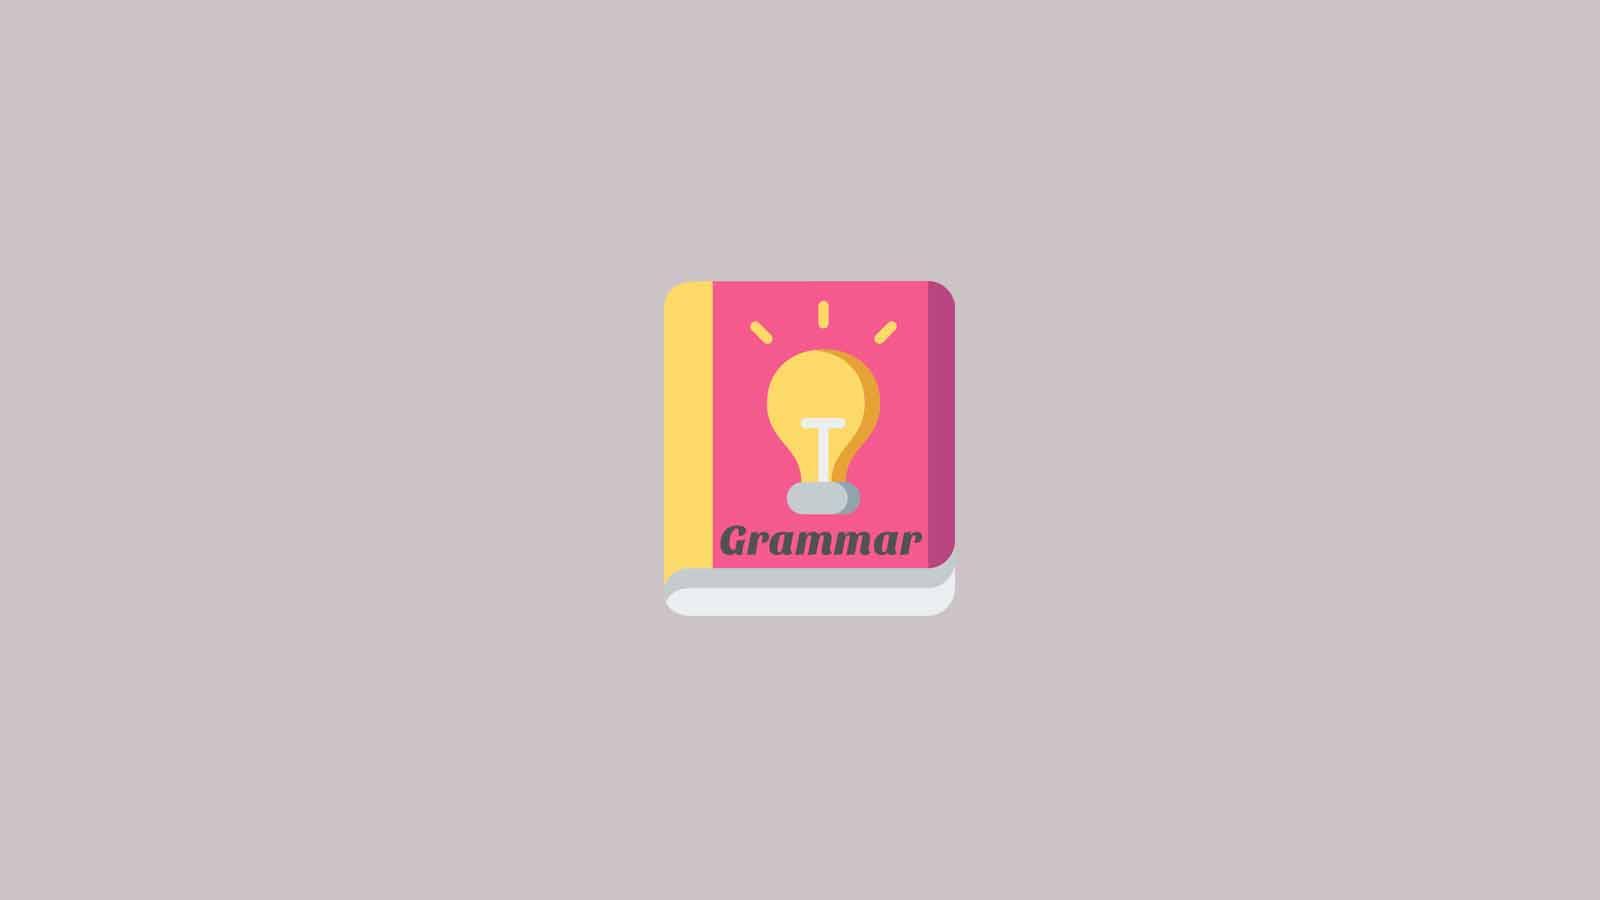 Daftar Isi - Grammar